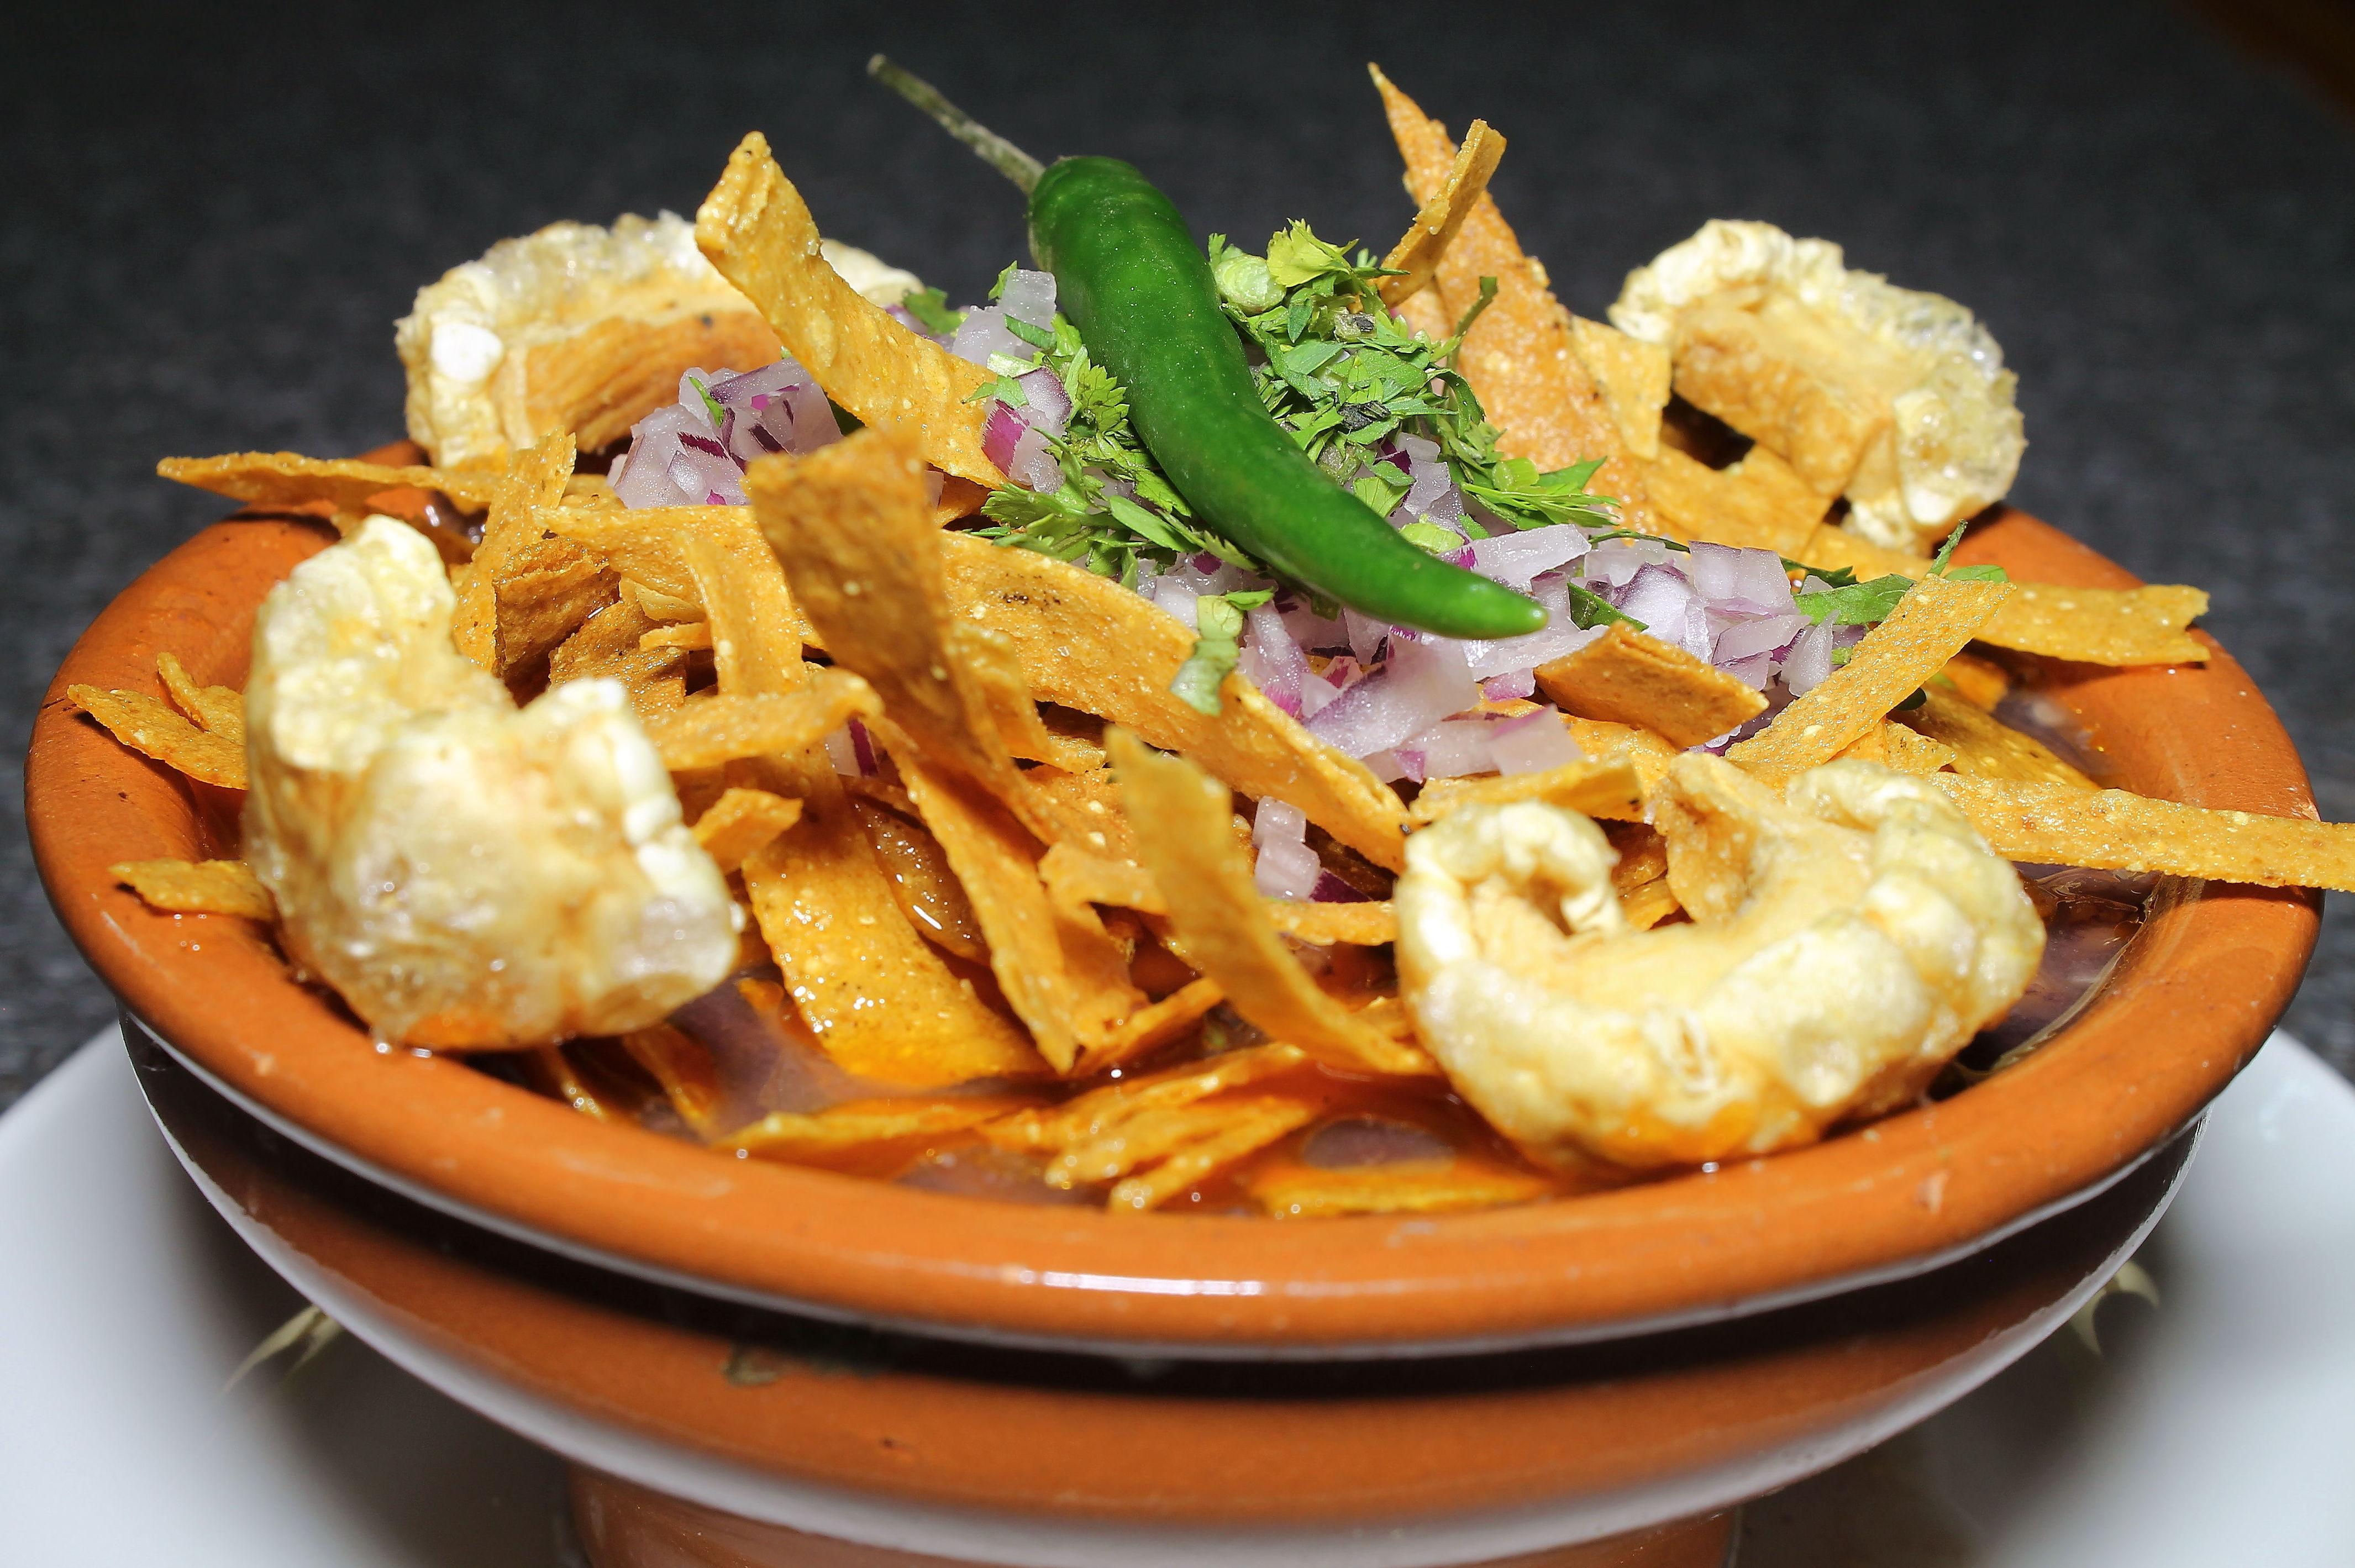 Platos de auténtica comida mexicana en el Restaurante Mezcal, Madrid